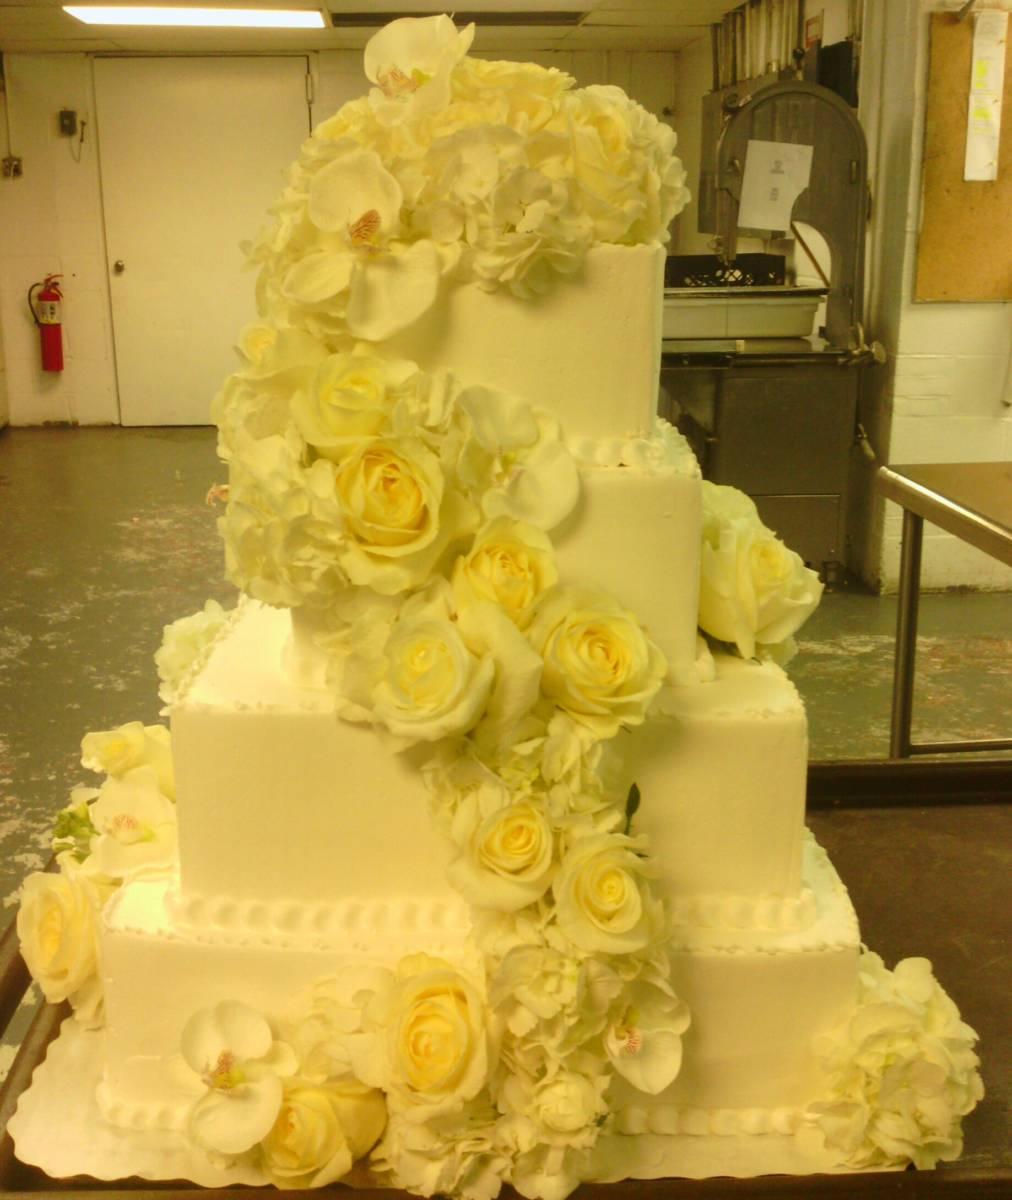 White Flower Wedding Cake: Unique Ideas For White Wedding Flowers